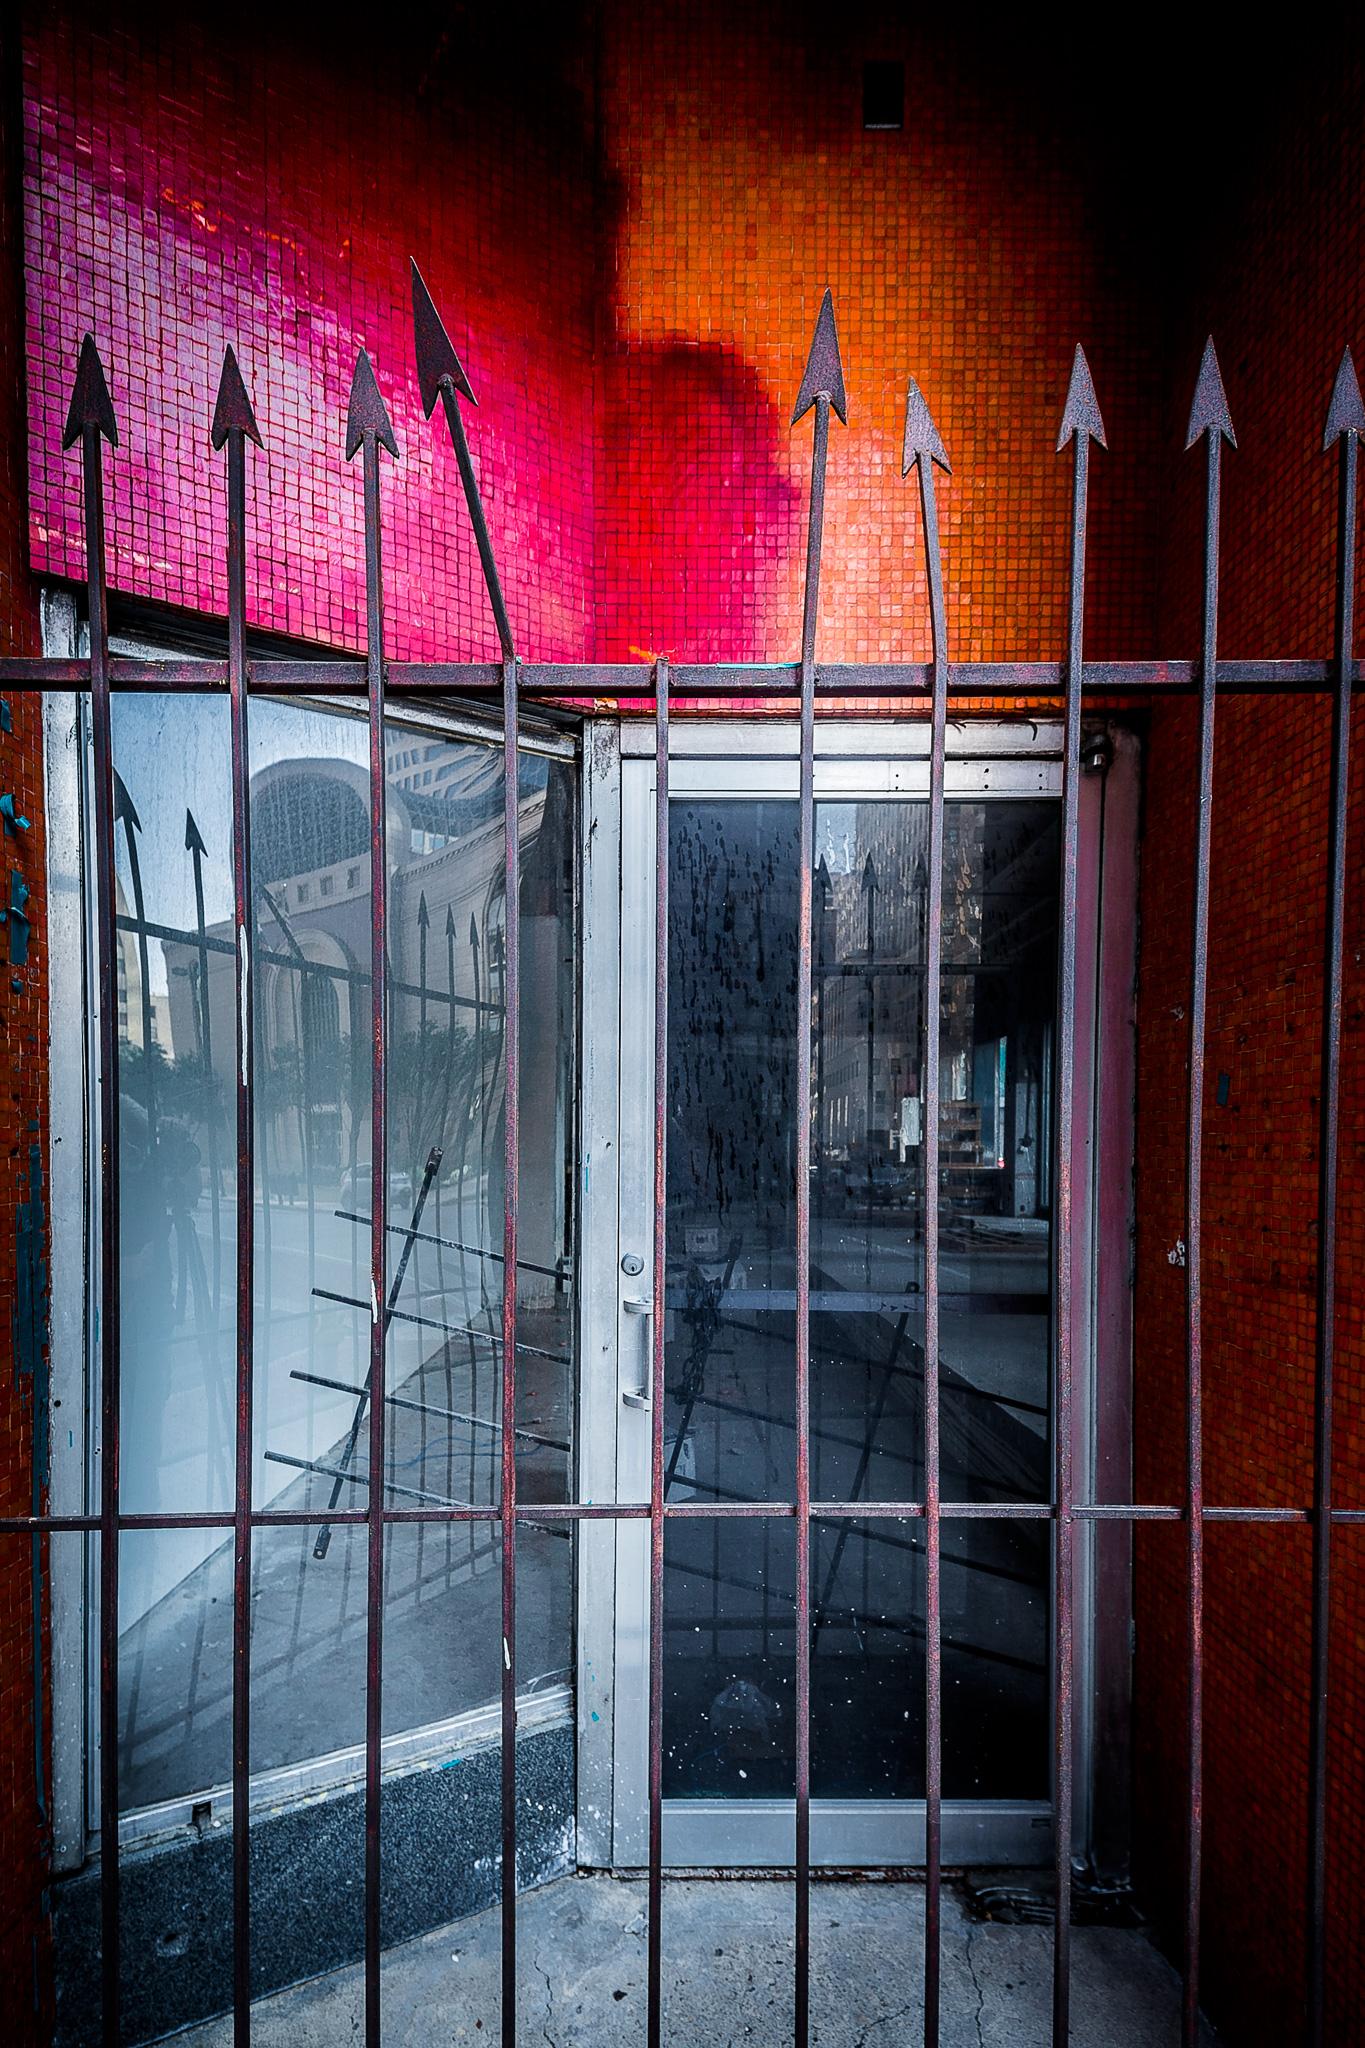 Mosaic-Behind-Bars.jpg